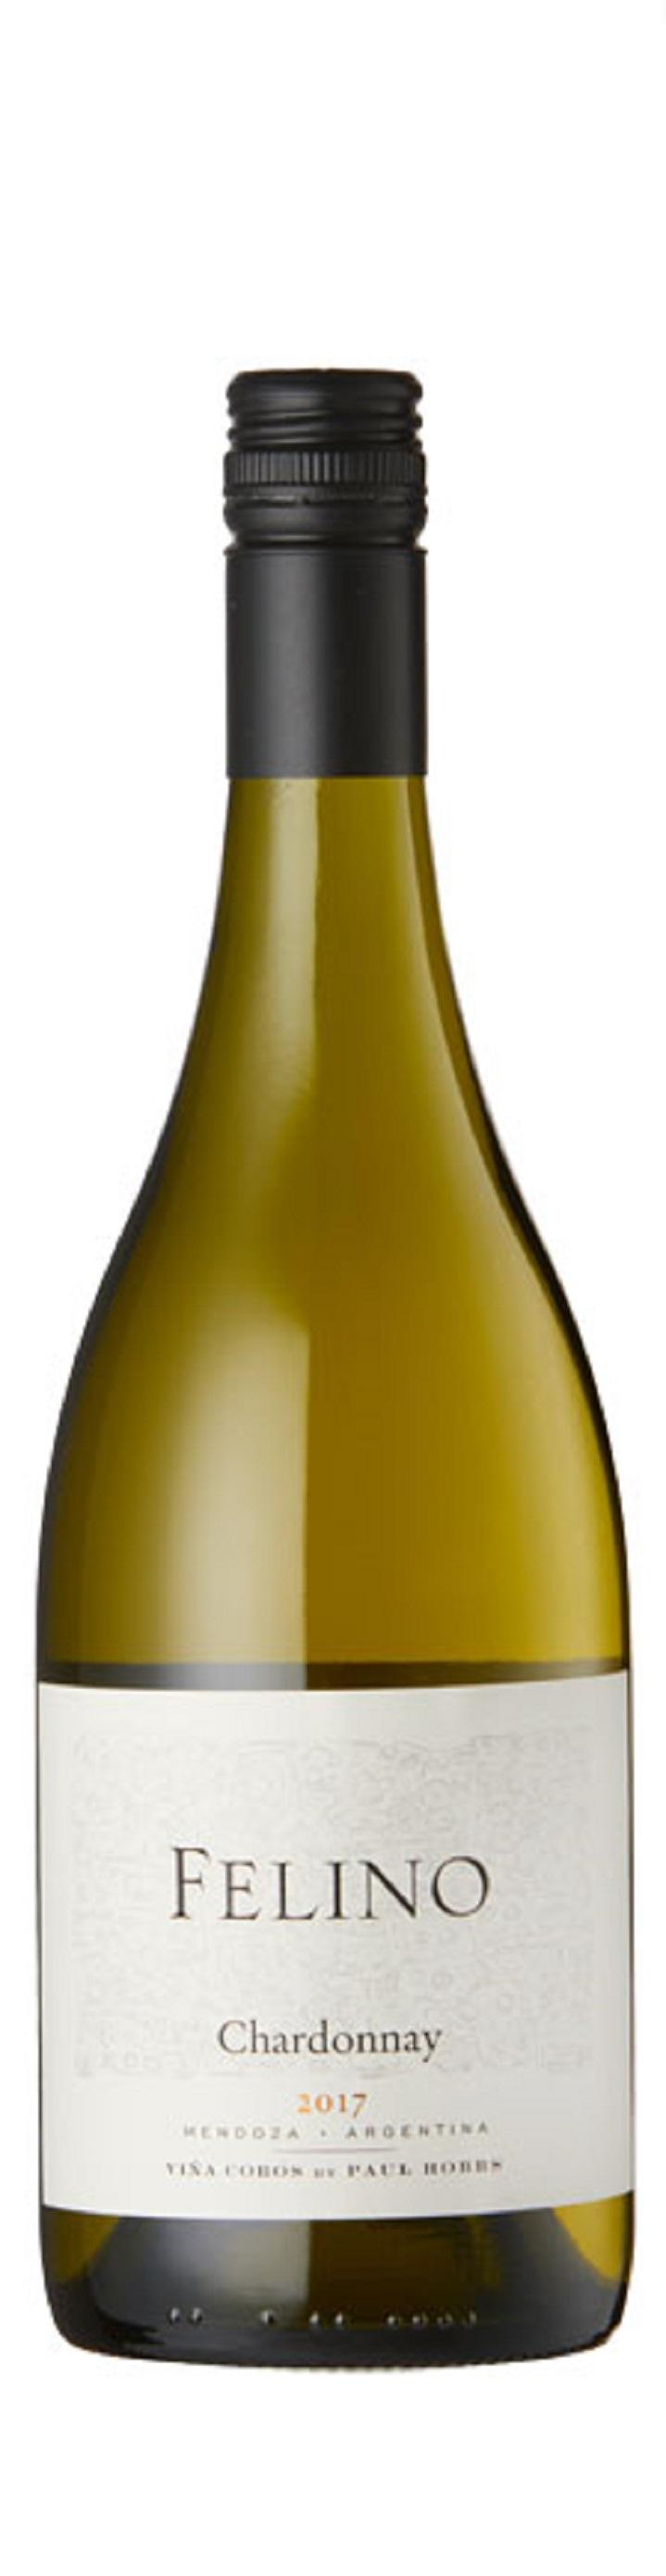 felino-vina-cobos-chardonnay